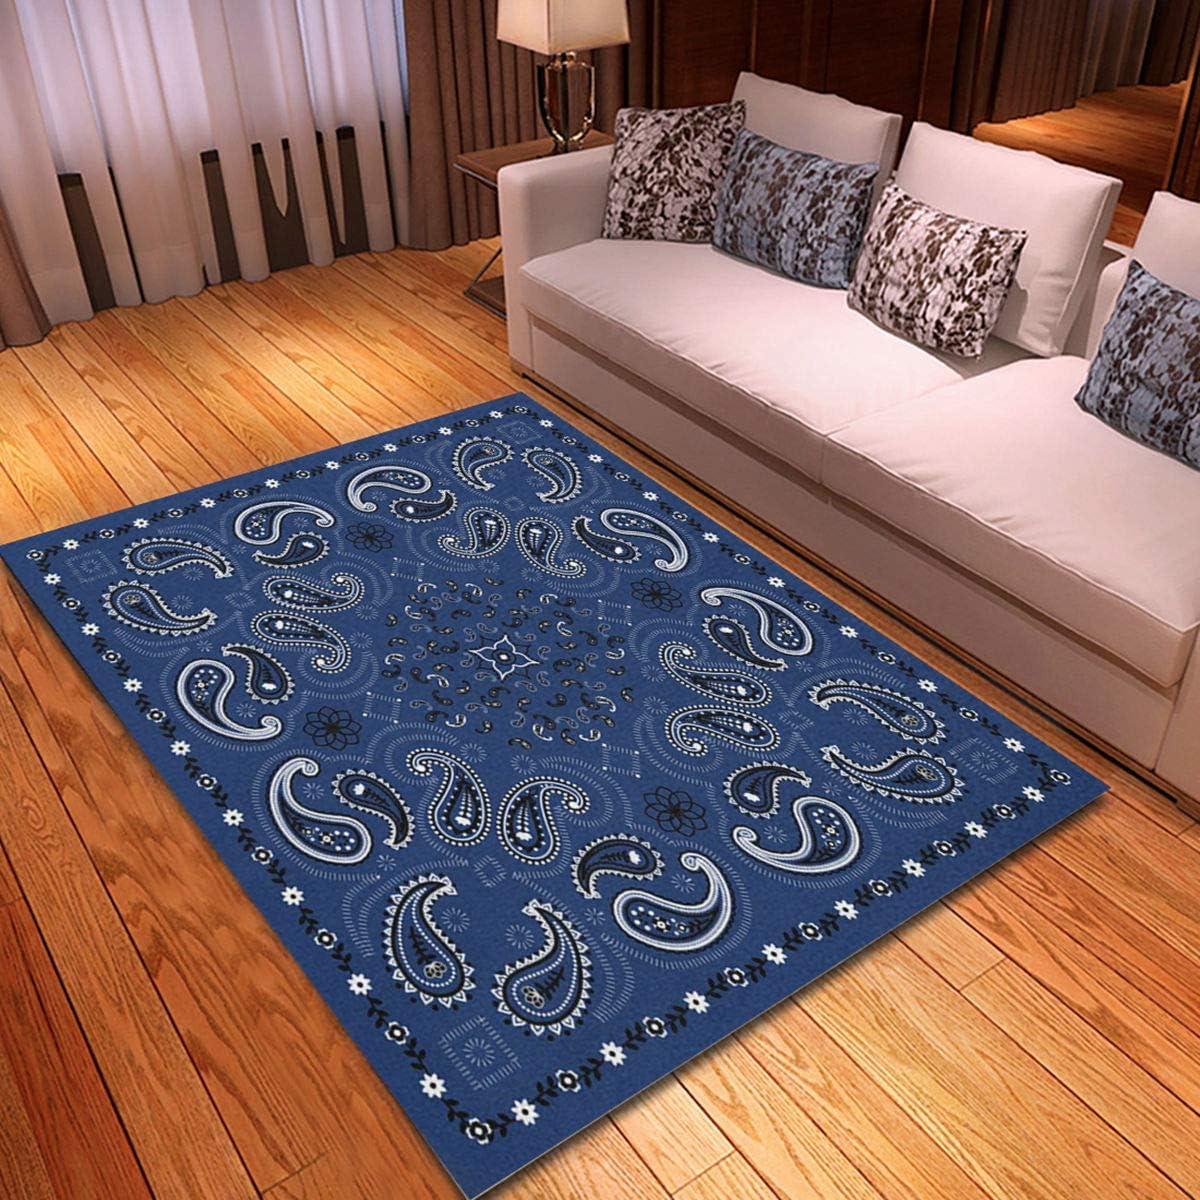 rouihot Purchase Non-Slip Area Rug 4'x 6' Pattern Super sale B Colorful Paisley Blue